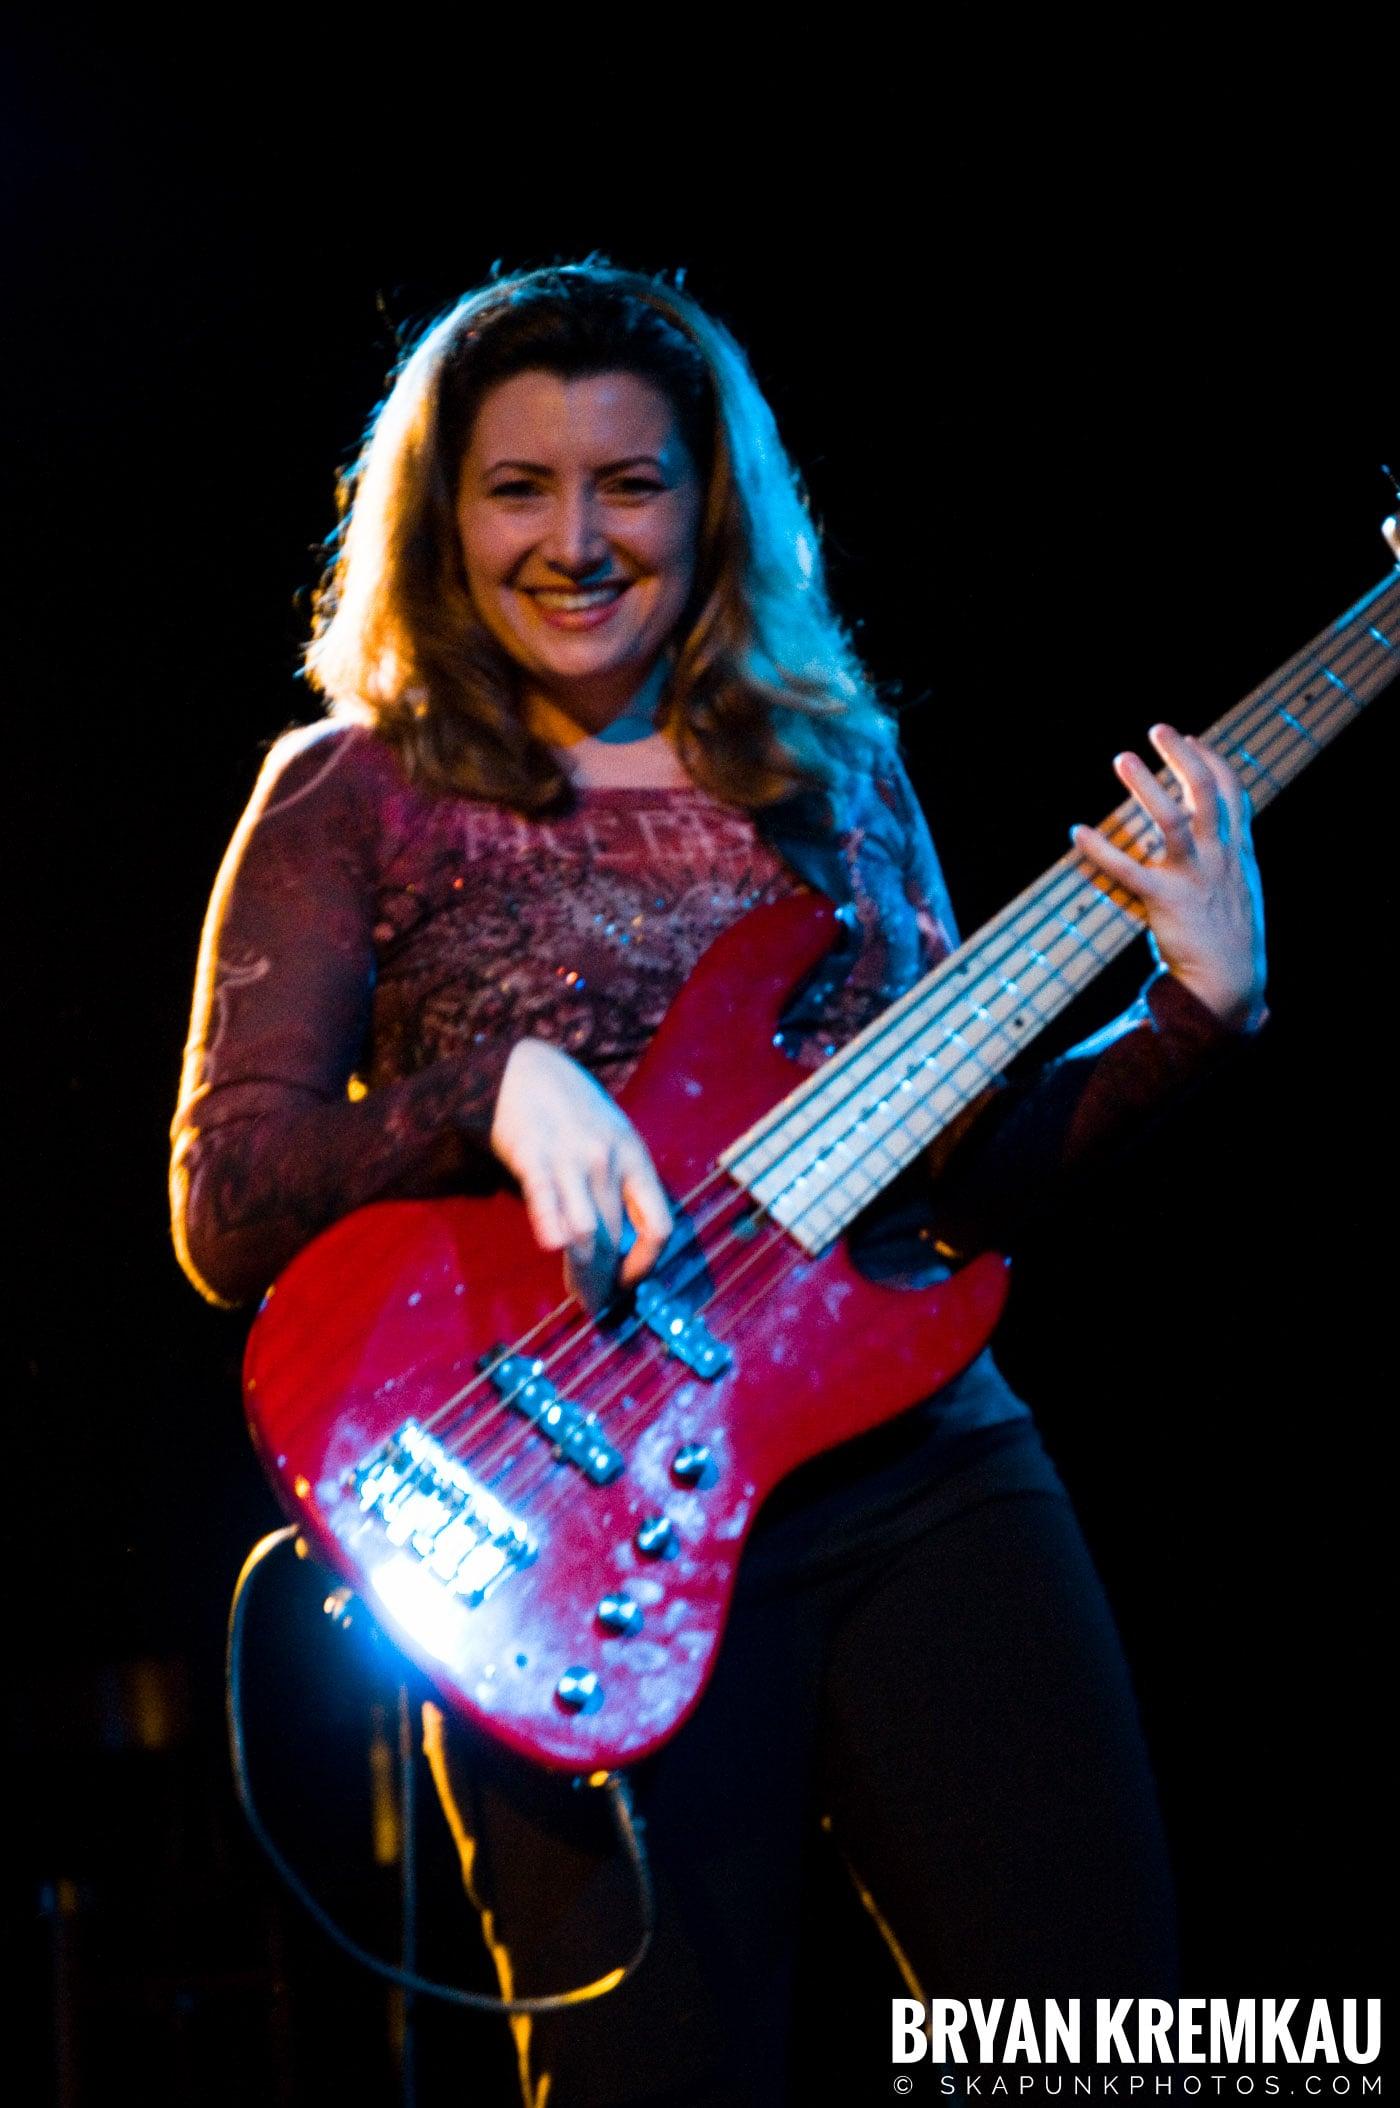 Pilfers (Ska is Dead Tour) @ Starland Ballroom, Sayreville, NJ - 11.15.09 (38)